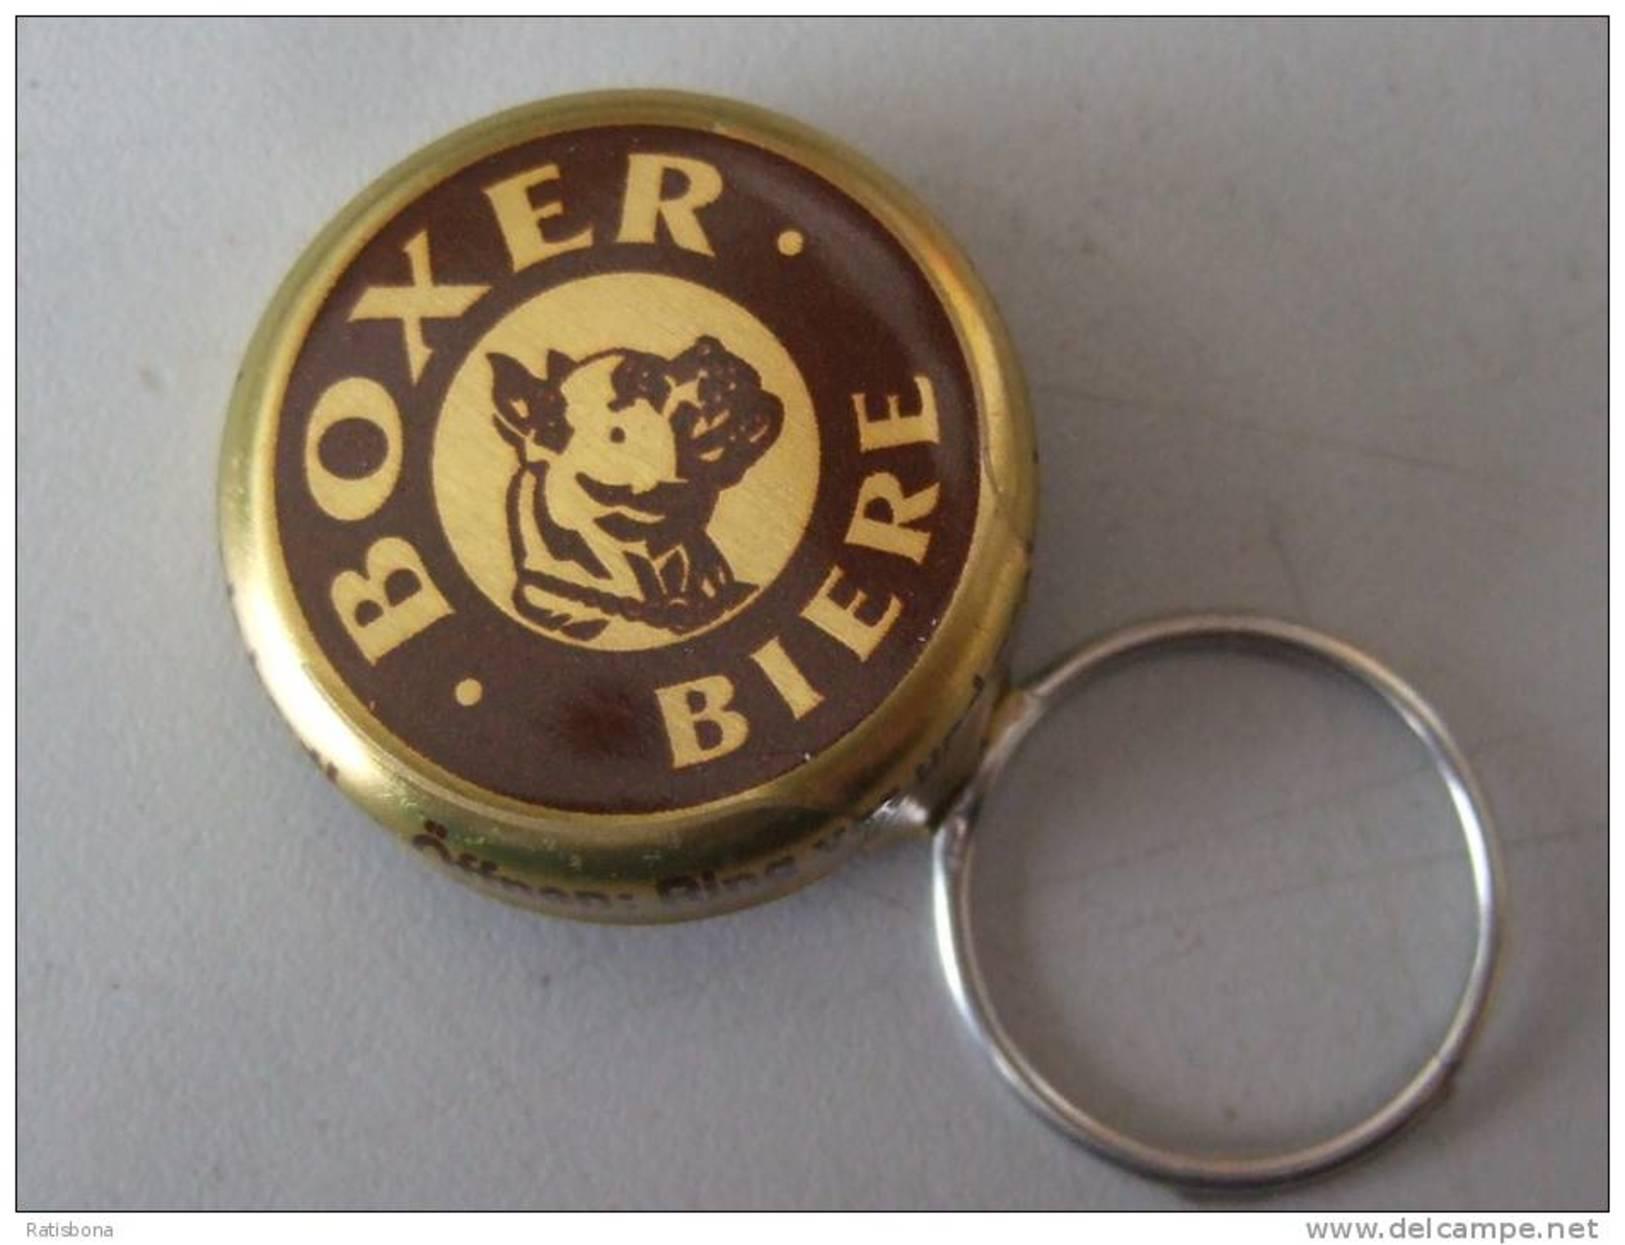 Brasserie Boxer, Lausanne , CH Ungebraucht - Kronkorken, Capsule Neuve, Crowncaps New - Bier